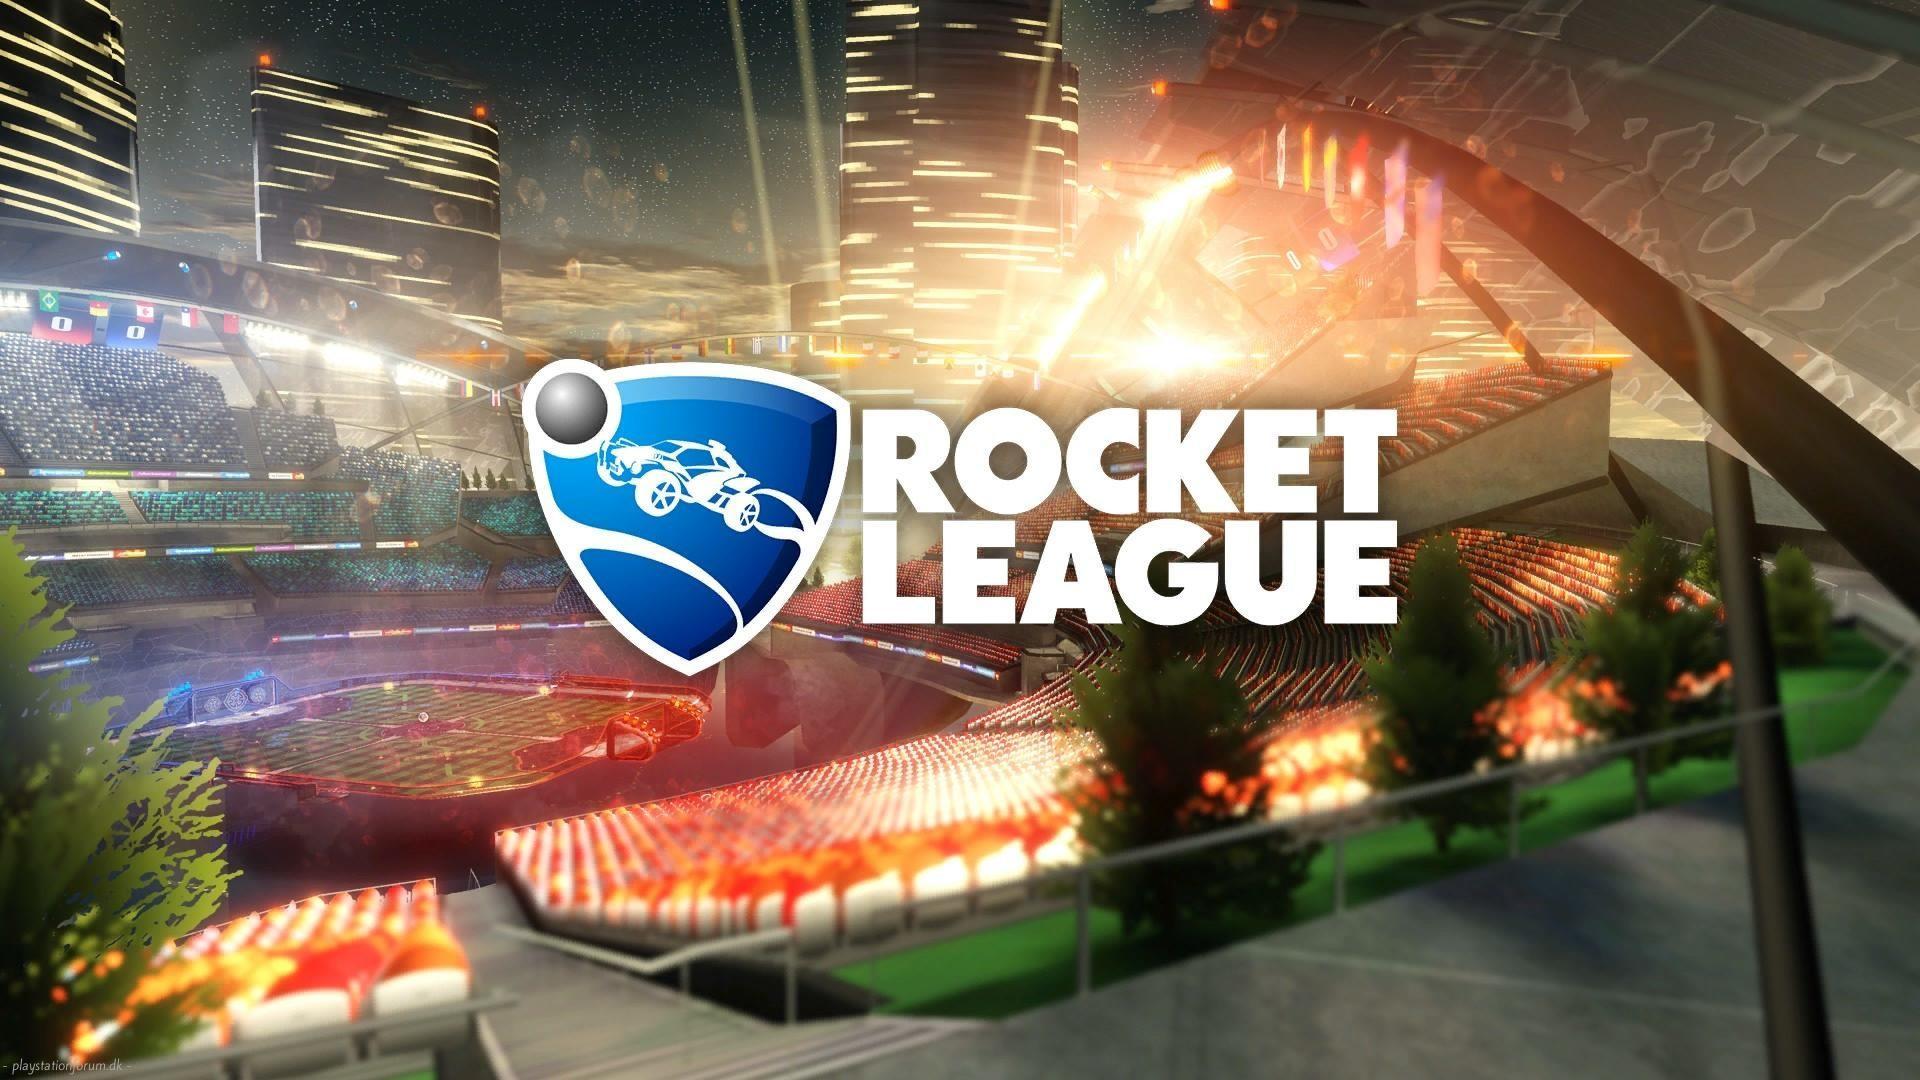 Rocket League Wallpapers, Pictures, Images